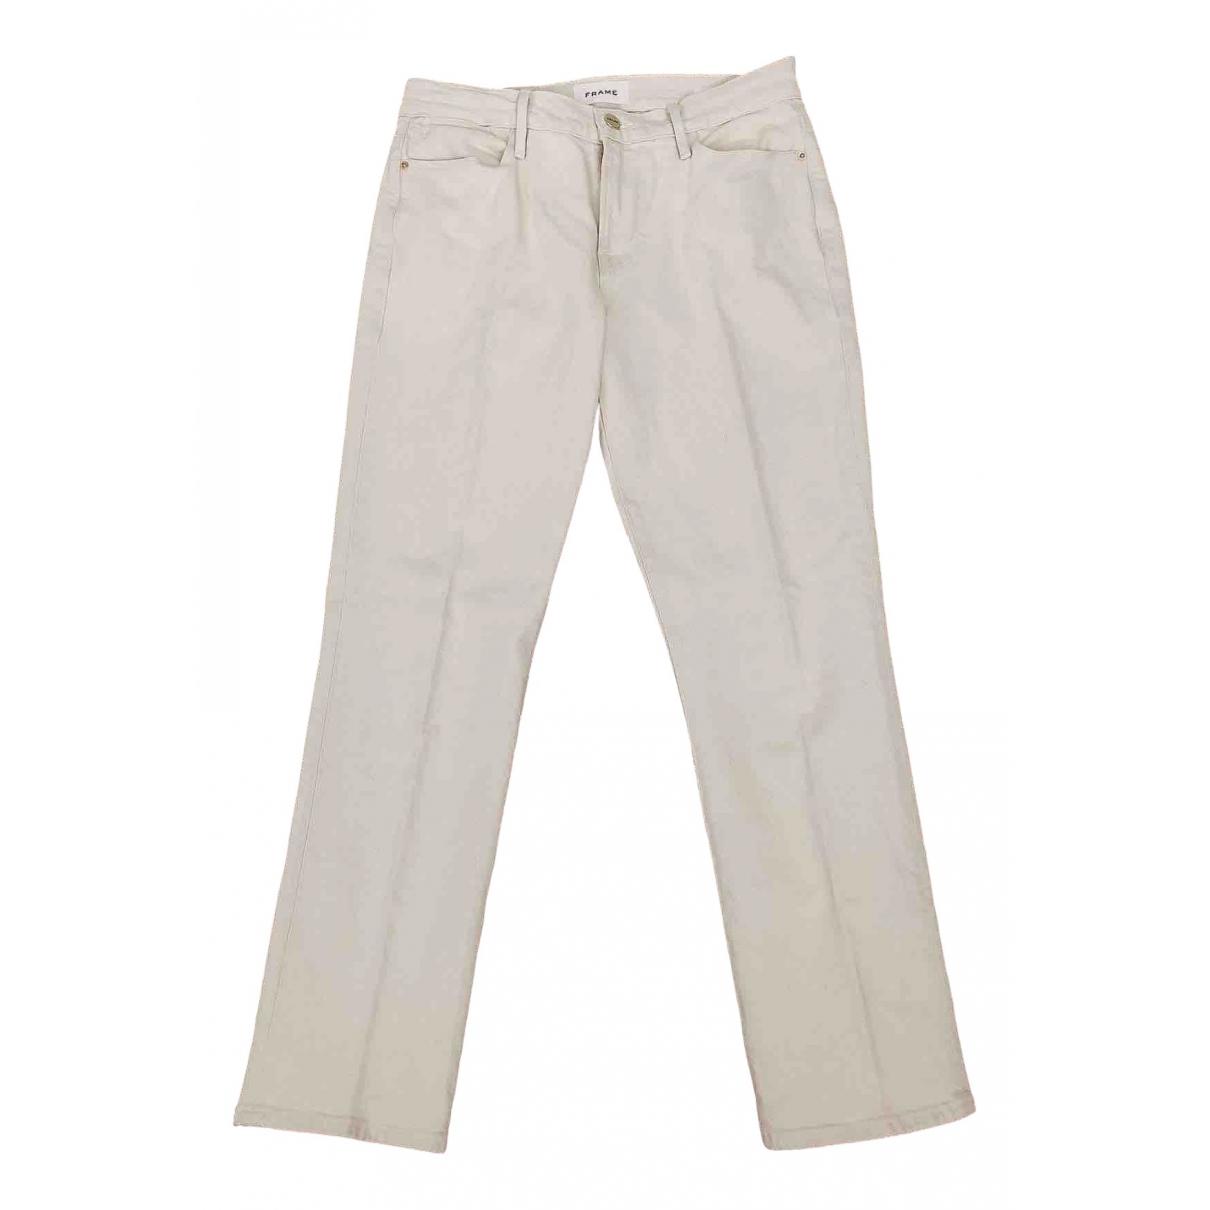 Frame Denim \N Ecru Cotton Jeans for Women 27 US